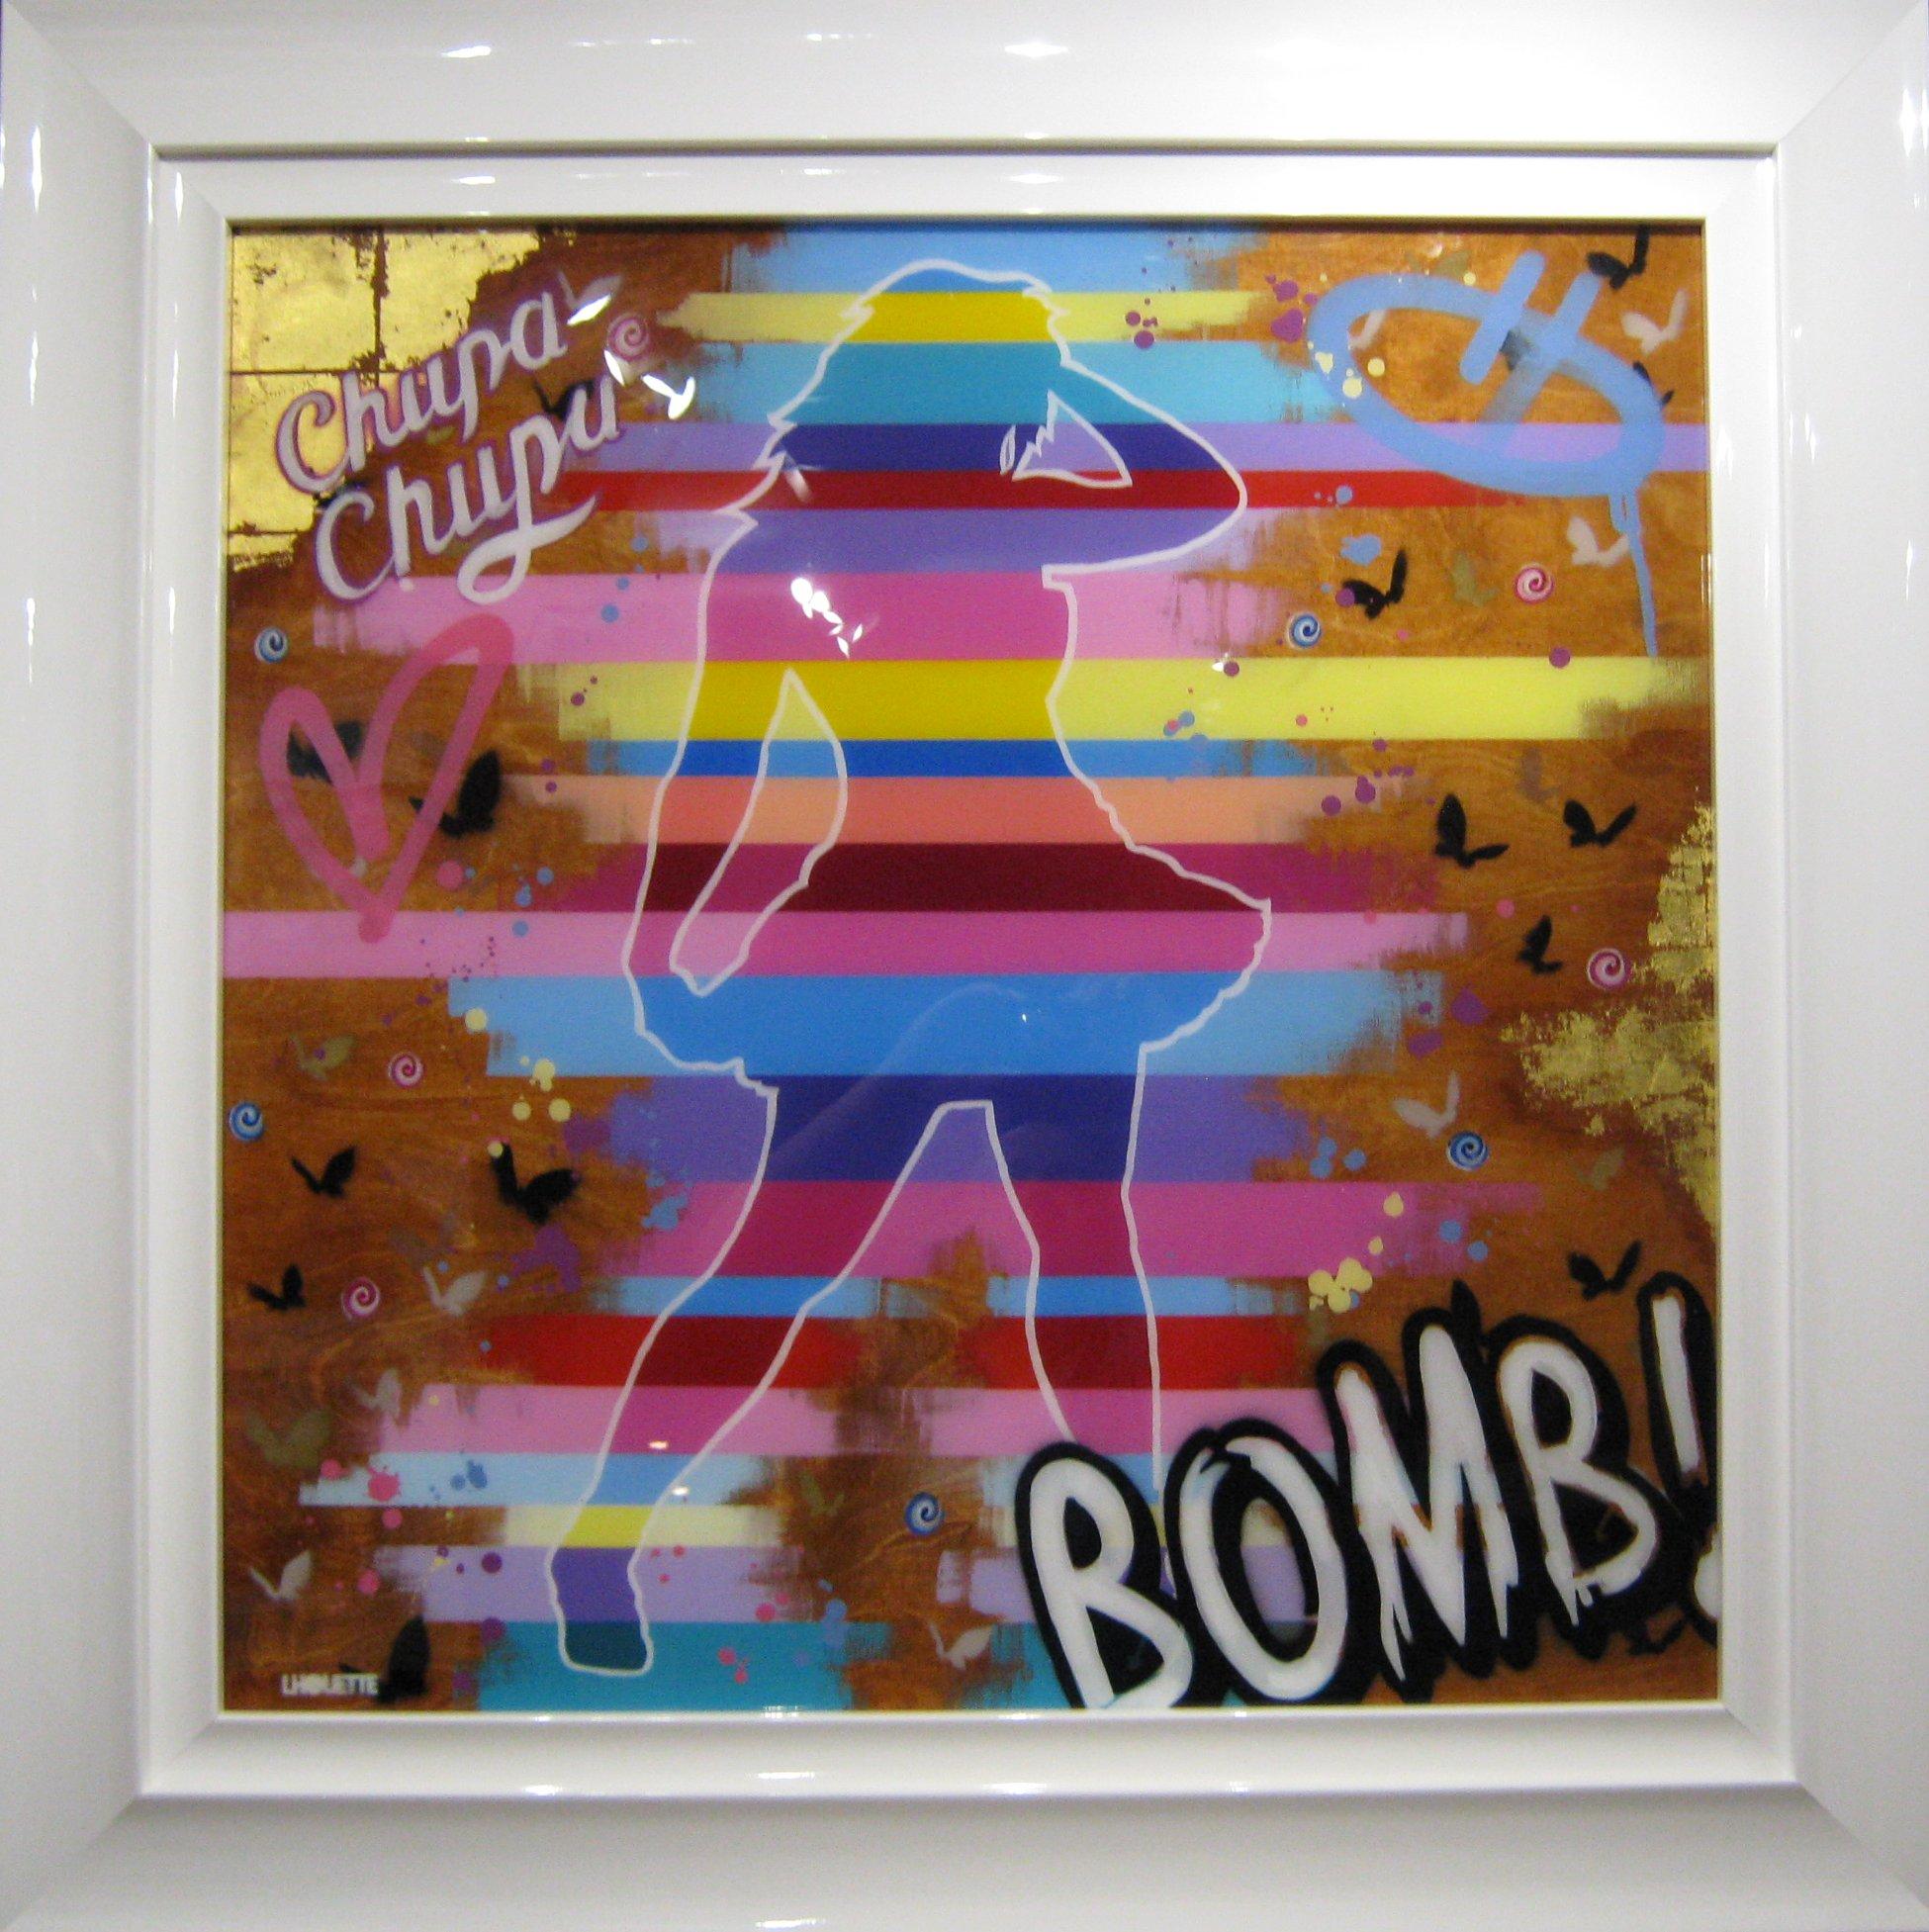 Sex Bomb by Lhouette